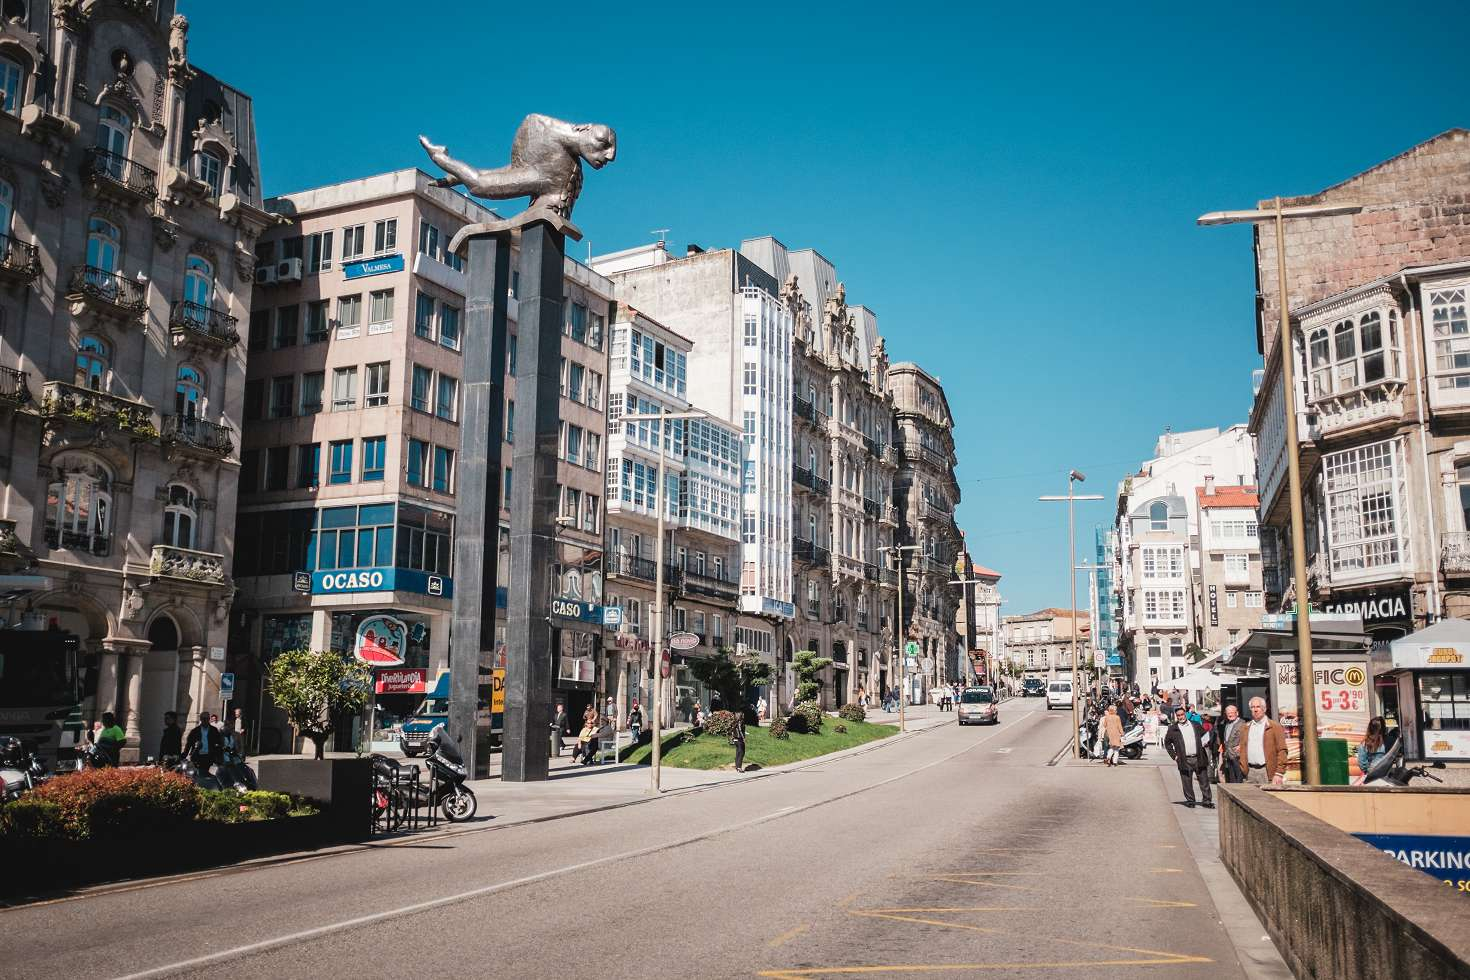 Valencia-Lissabon-Vigo-Stonehenge (62)